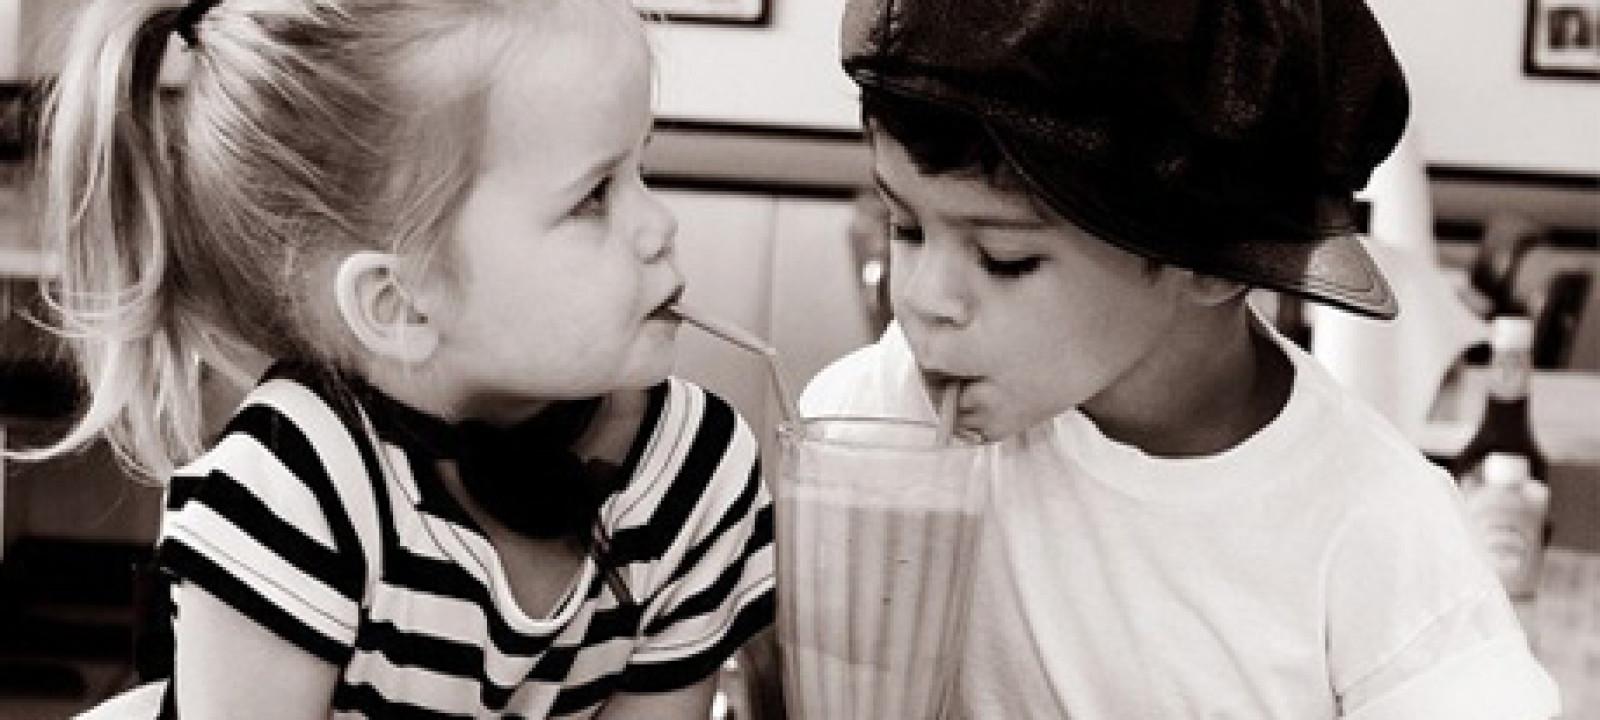 460x300_kids_milkshake